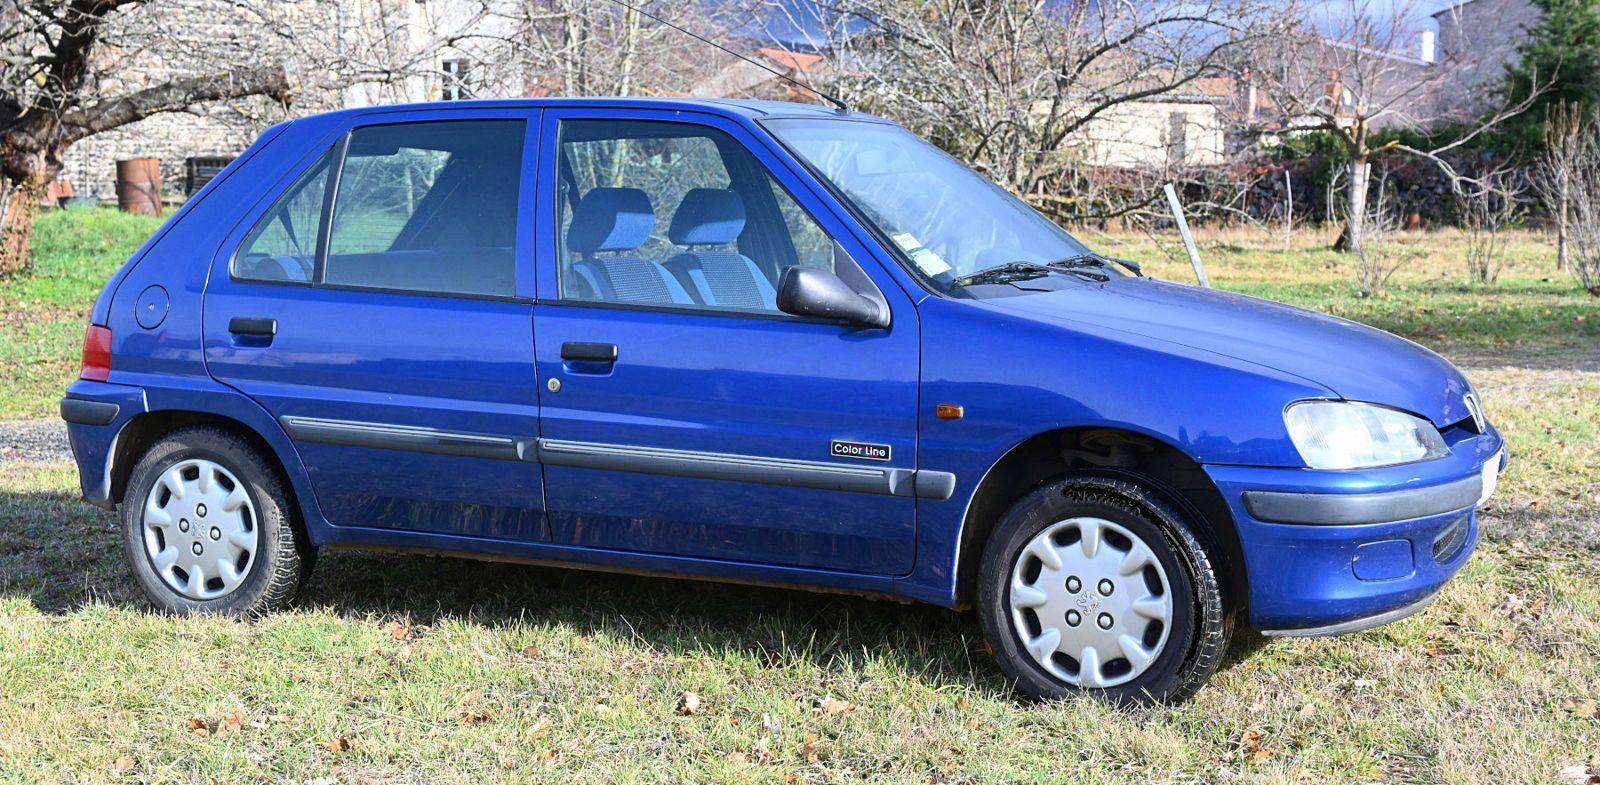 Vends PEUGEOT 106essence - 109000km 1997